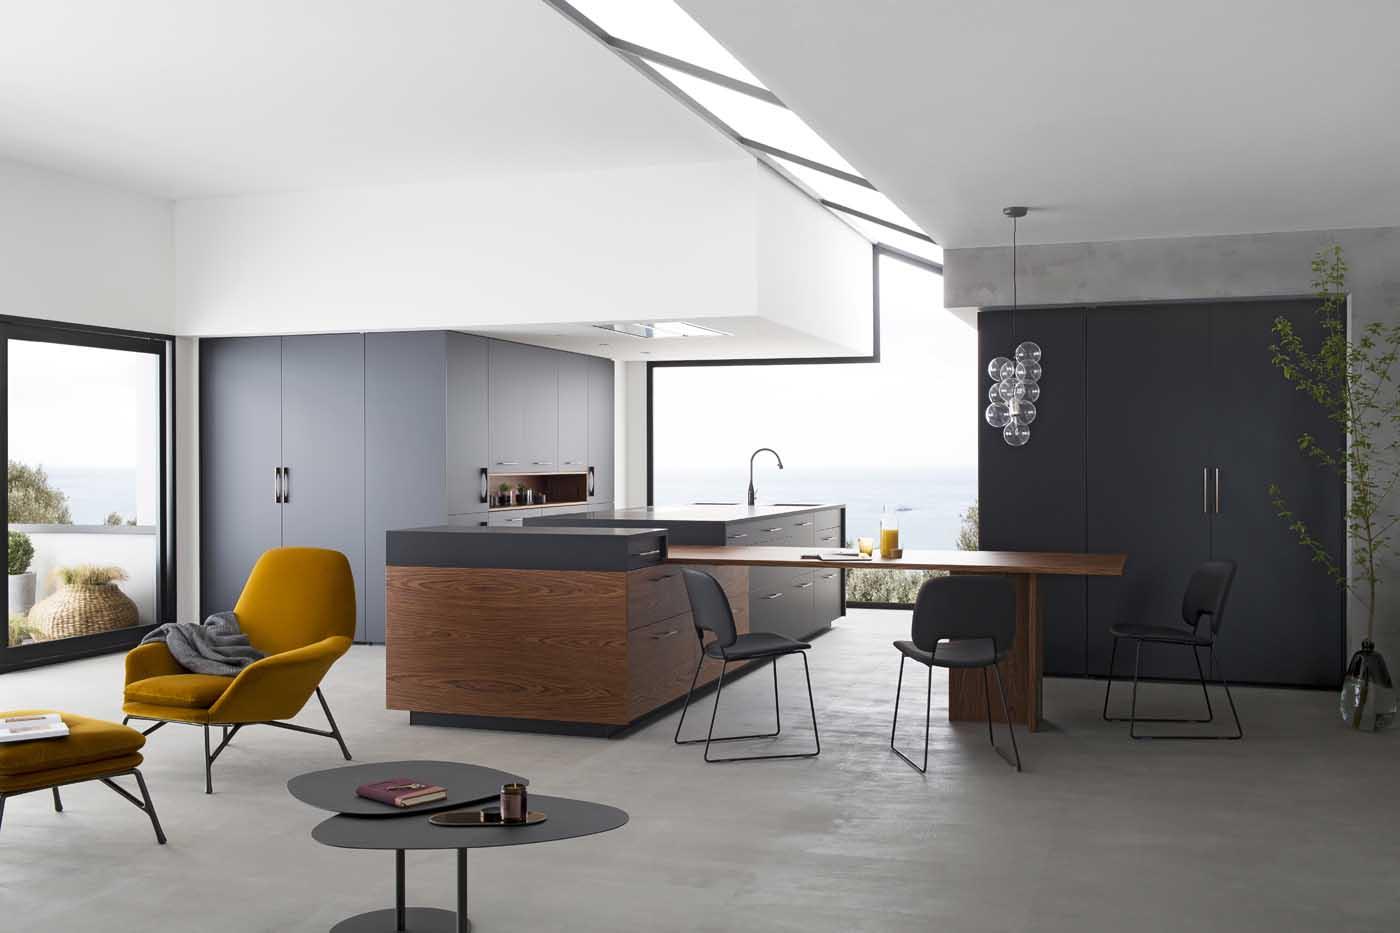 cuisine b600h placage palissandre v200 verni noir mat perene lyon. Black Bedroom Furniture Sets. Home Design Ideas